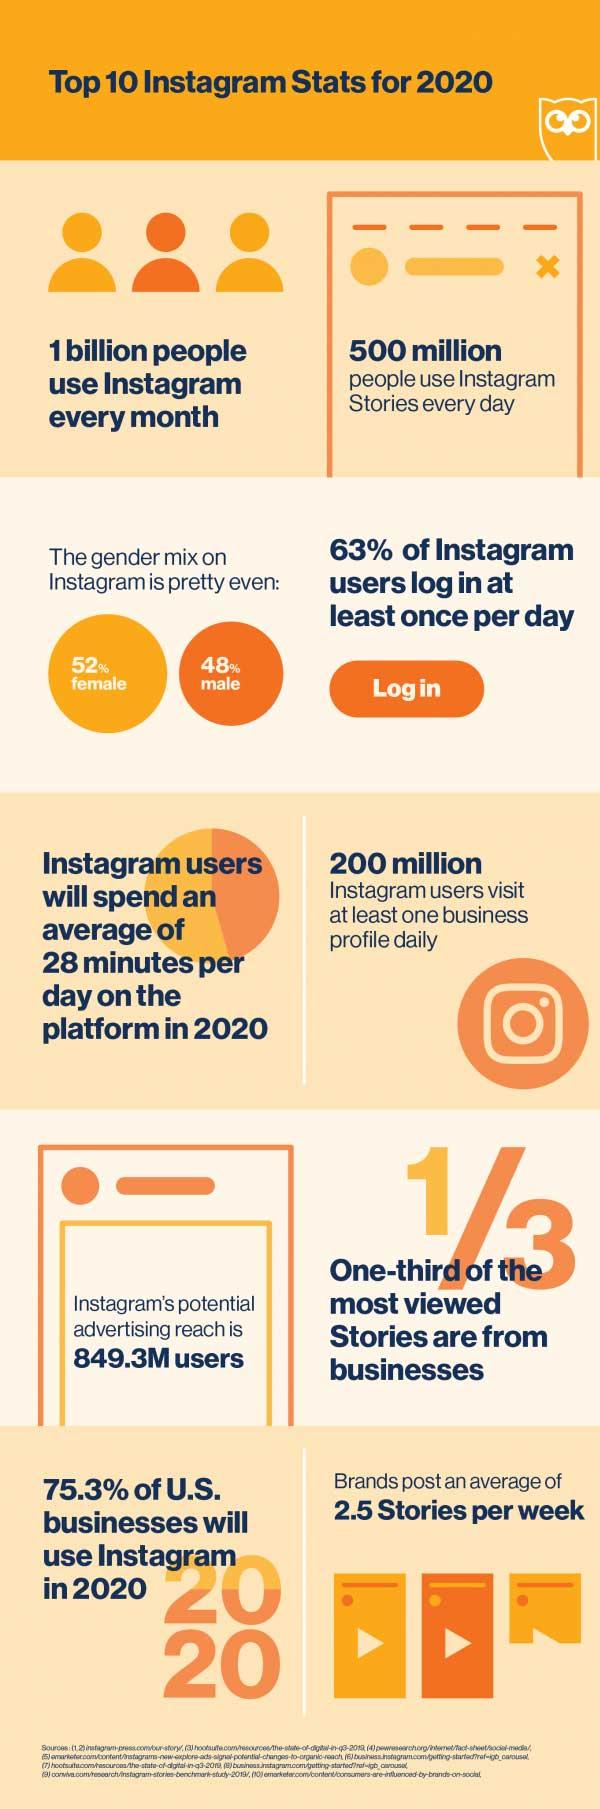 https://blog-assets.hootsuite.com/wp-content/uploads/2019/10/Top-10-Instagram-stats-620x1809.png